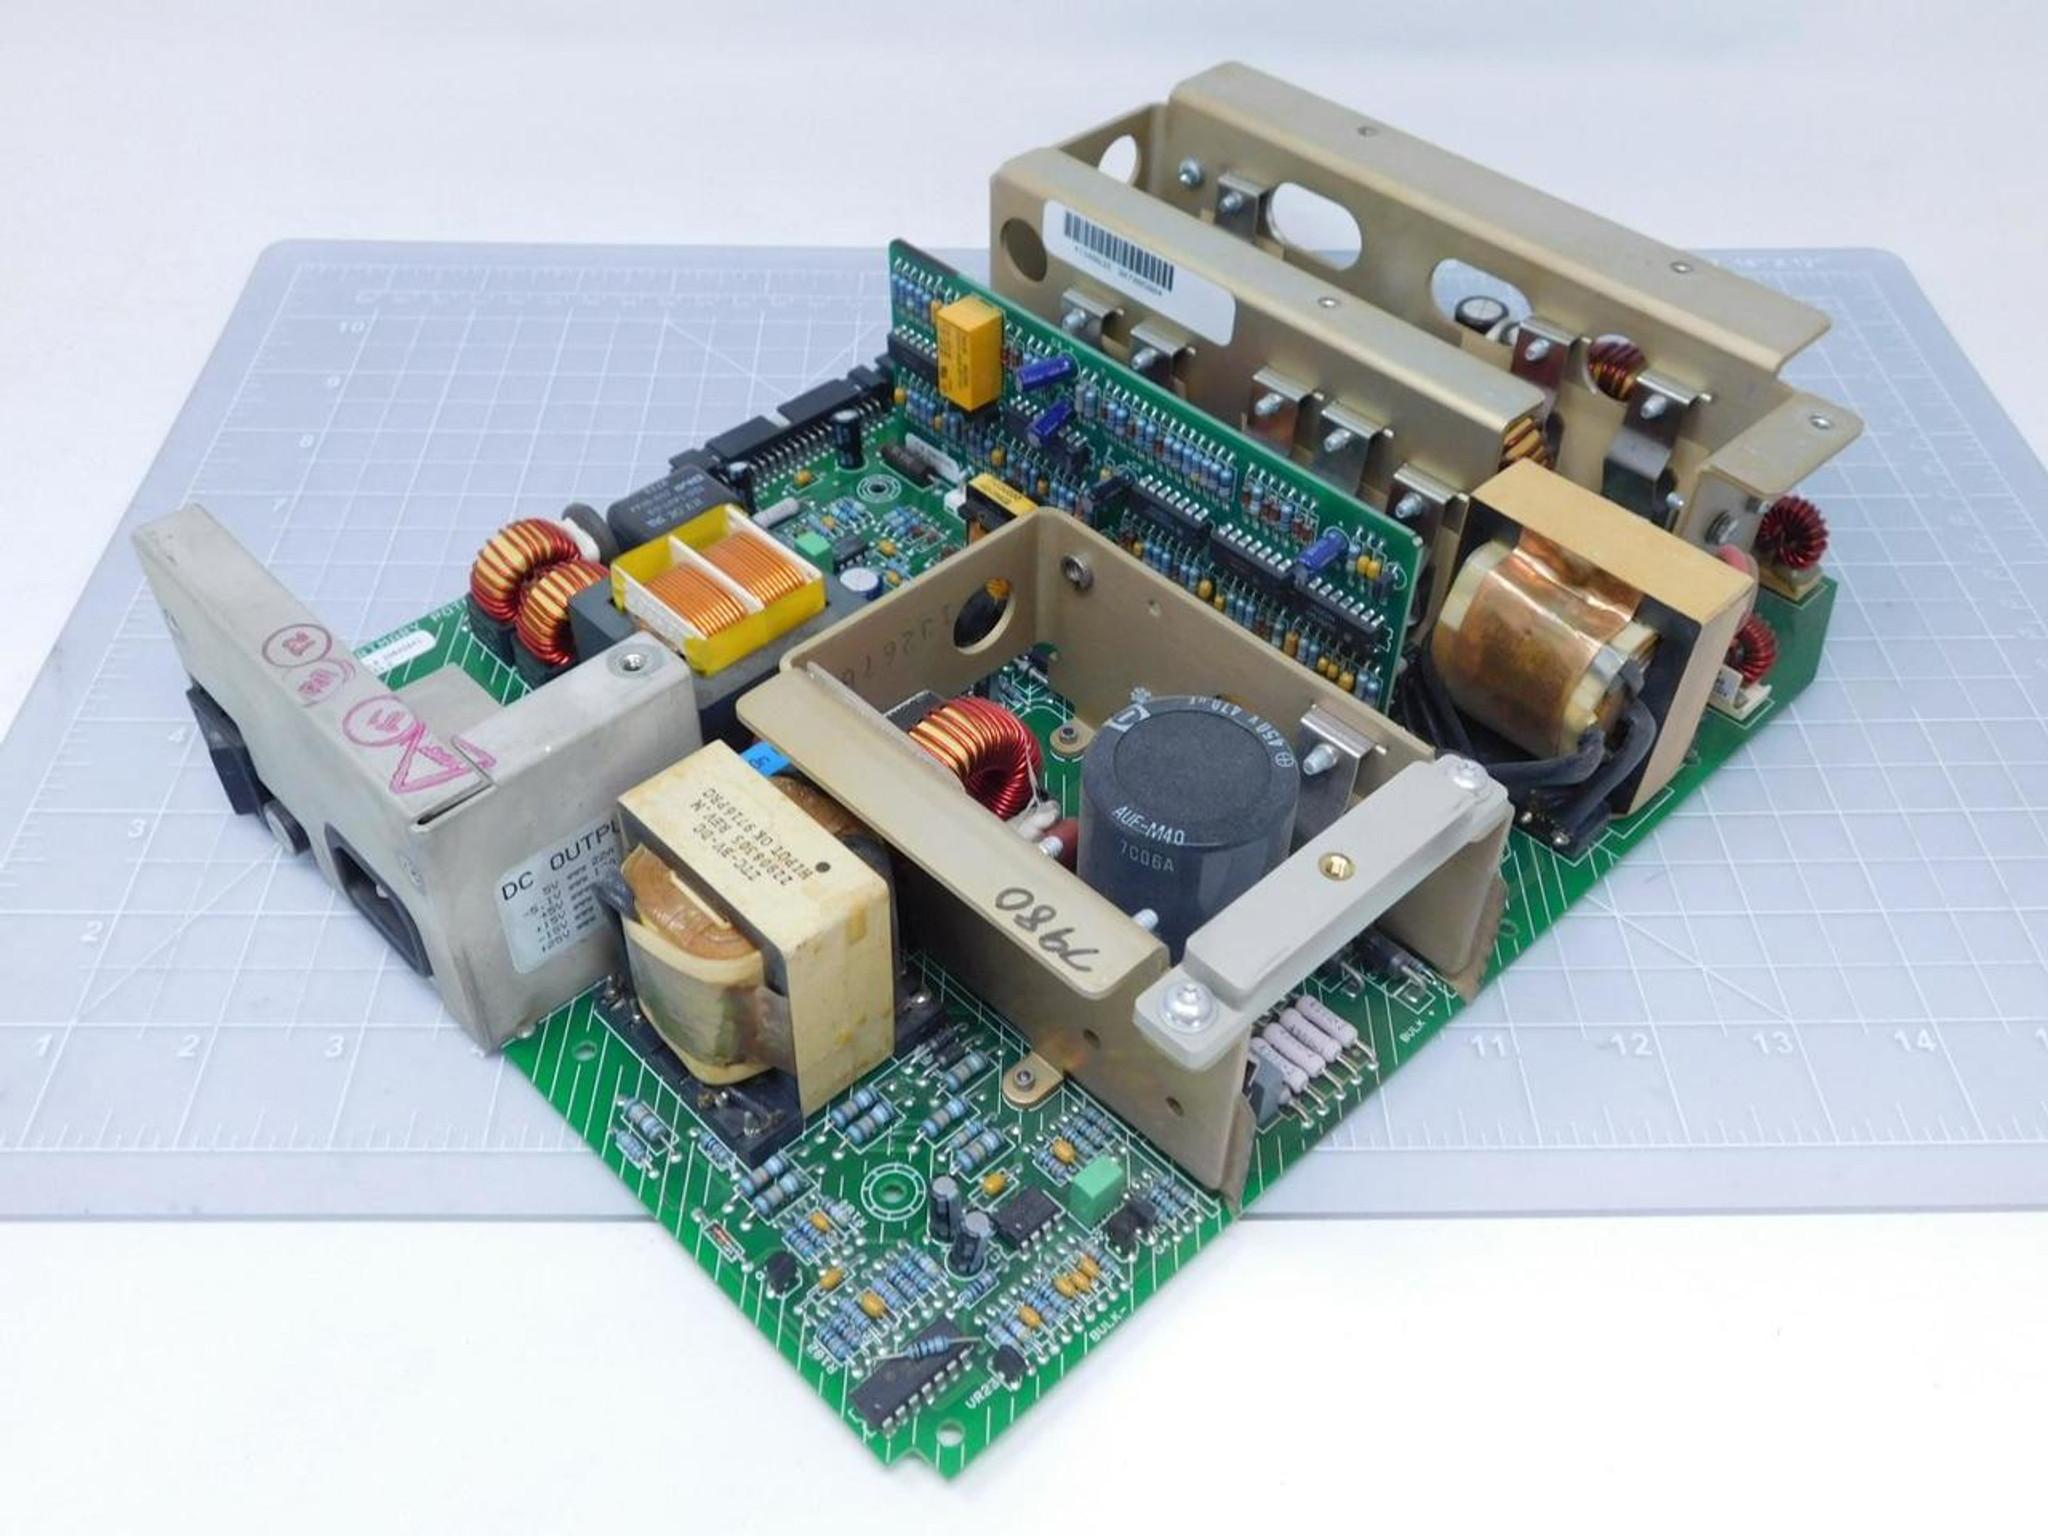 Tektronix 22943040 LV Power Supply 100-250 V 50-60/400 Hz 1 PH 4 5 A 400 W  T125150